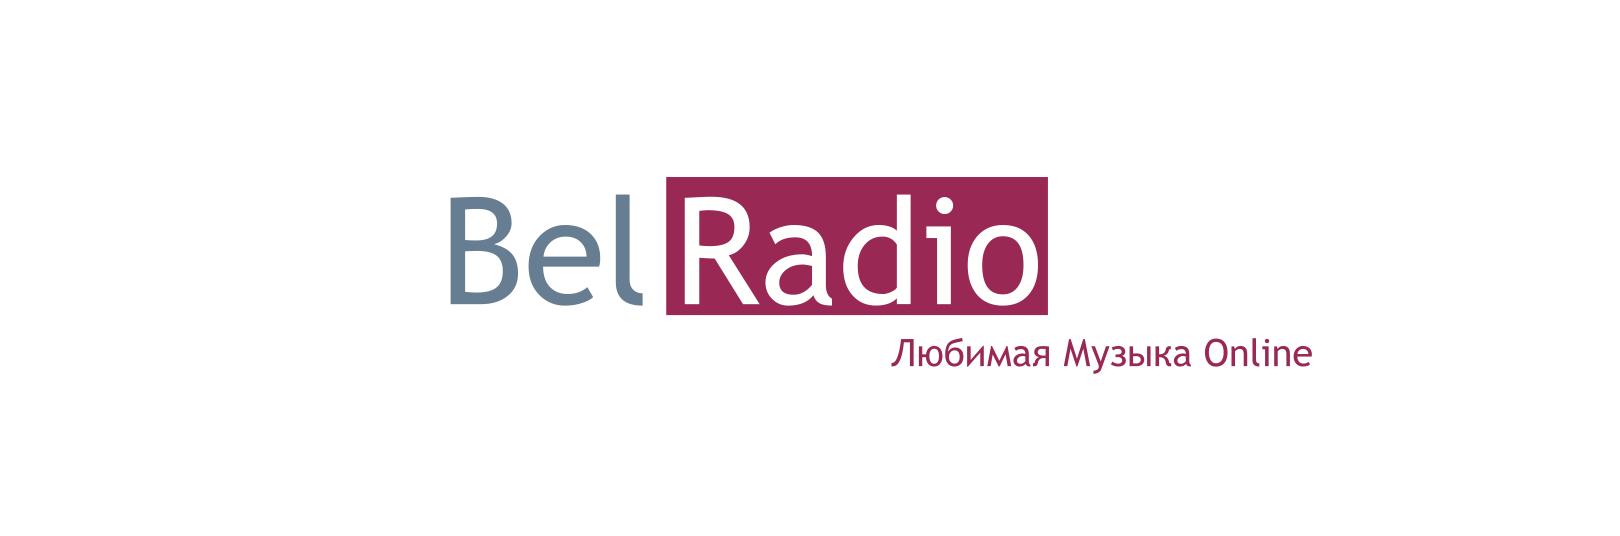 http://belradio.net/logo/white/belradio.png